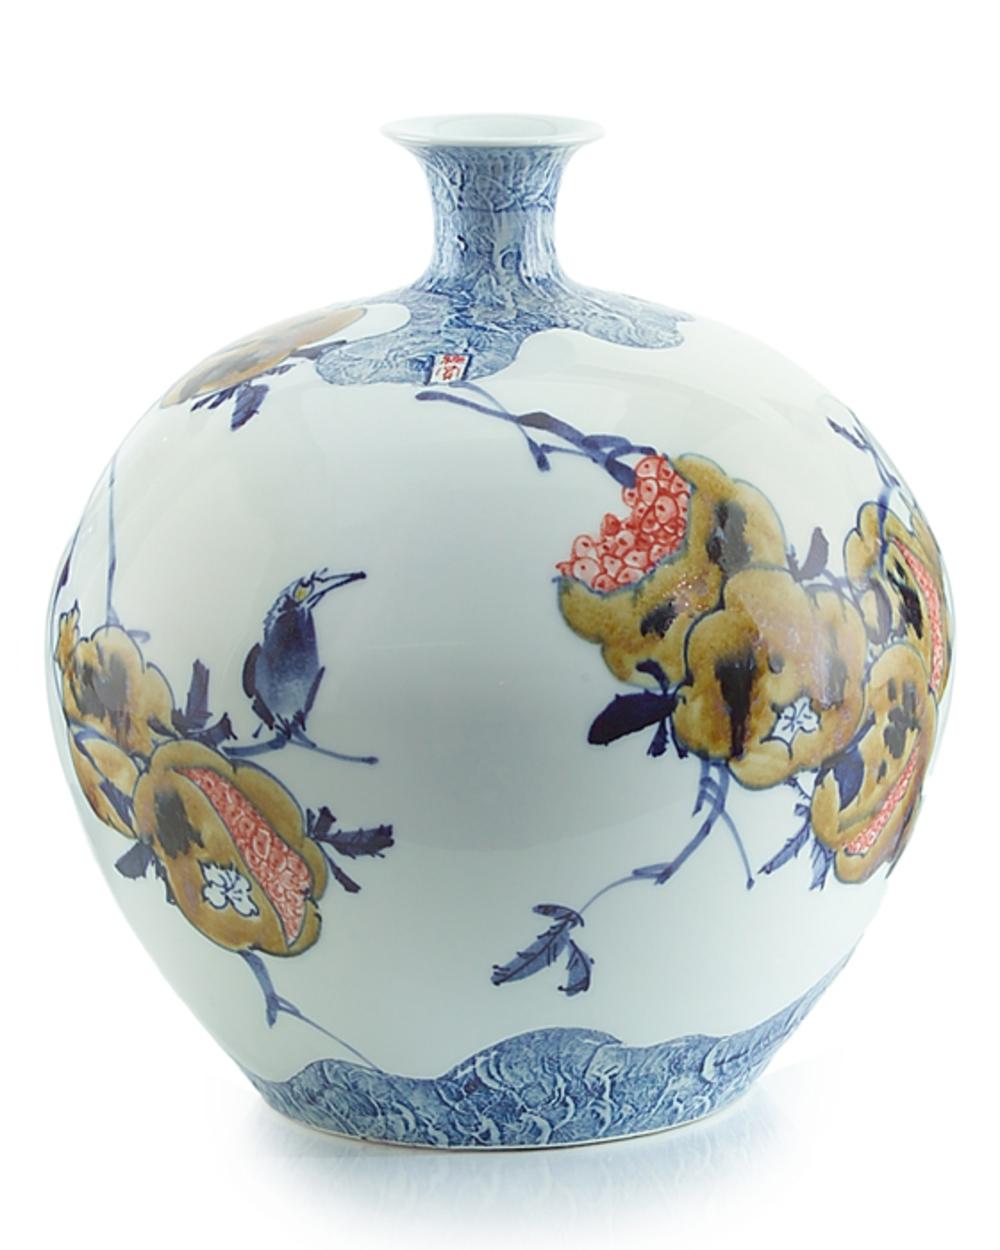 JOHN RICHARD COLLECTION - Gallery Round Vase